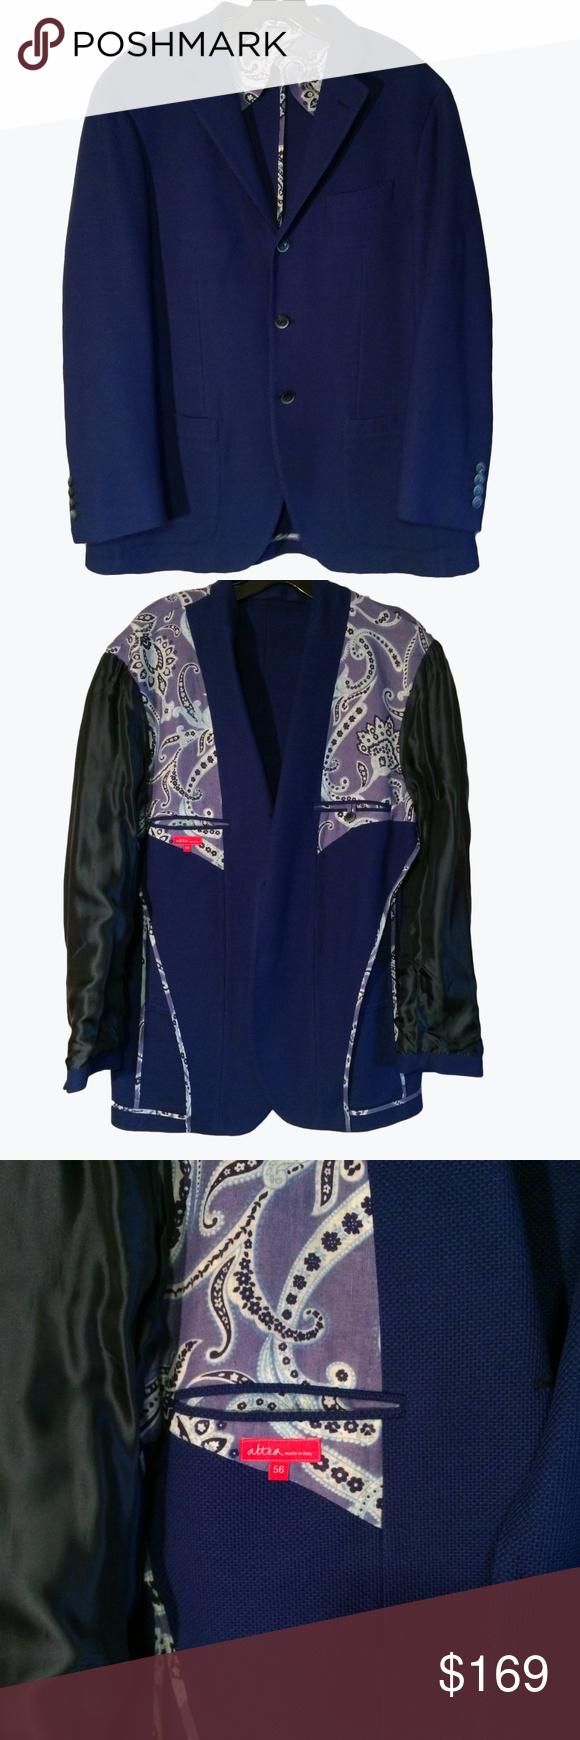 5fea57a2188 Altea Men s Blue Blazer Sport Coat US 46R  1325 Altea LUXURIOUS Blue 3  Button Sport Coat